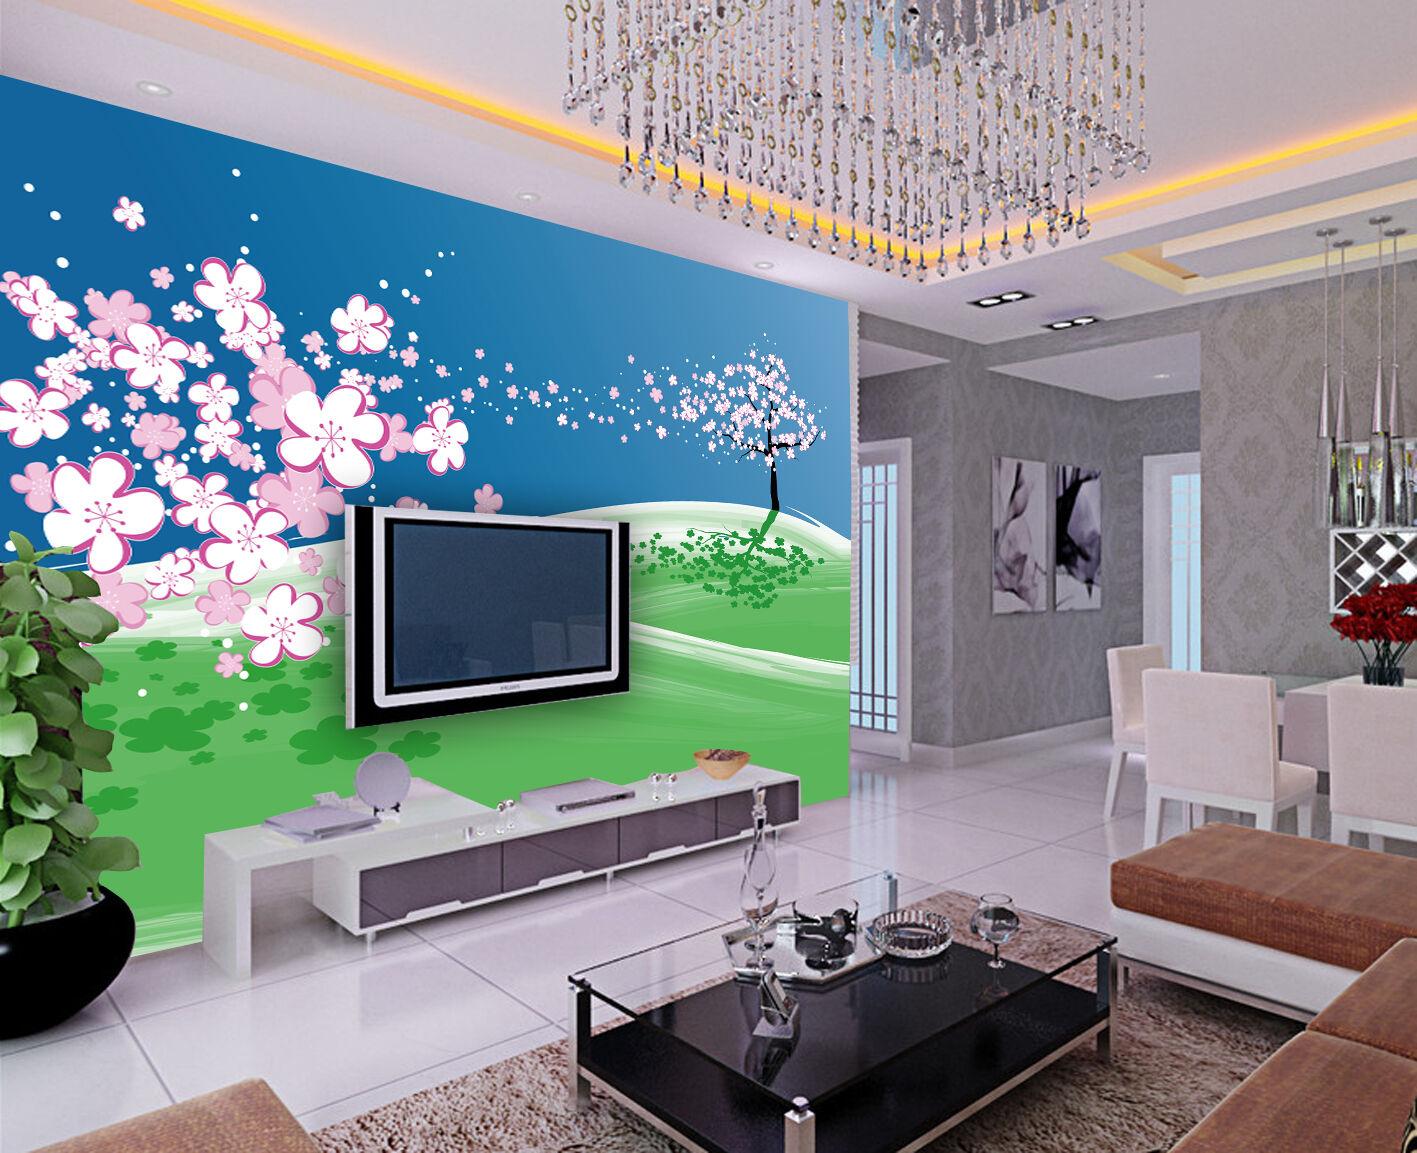 3D Lawn trees 1 WallPaper Murals Wall Print Decal Wall Deco AJ WALLPAPER